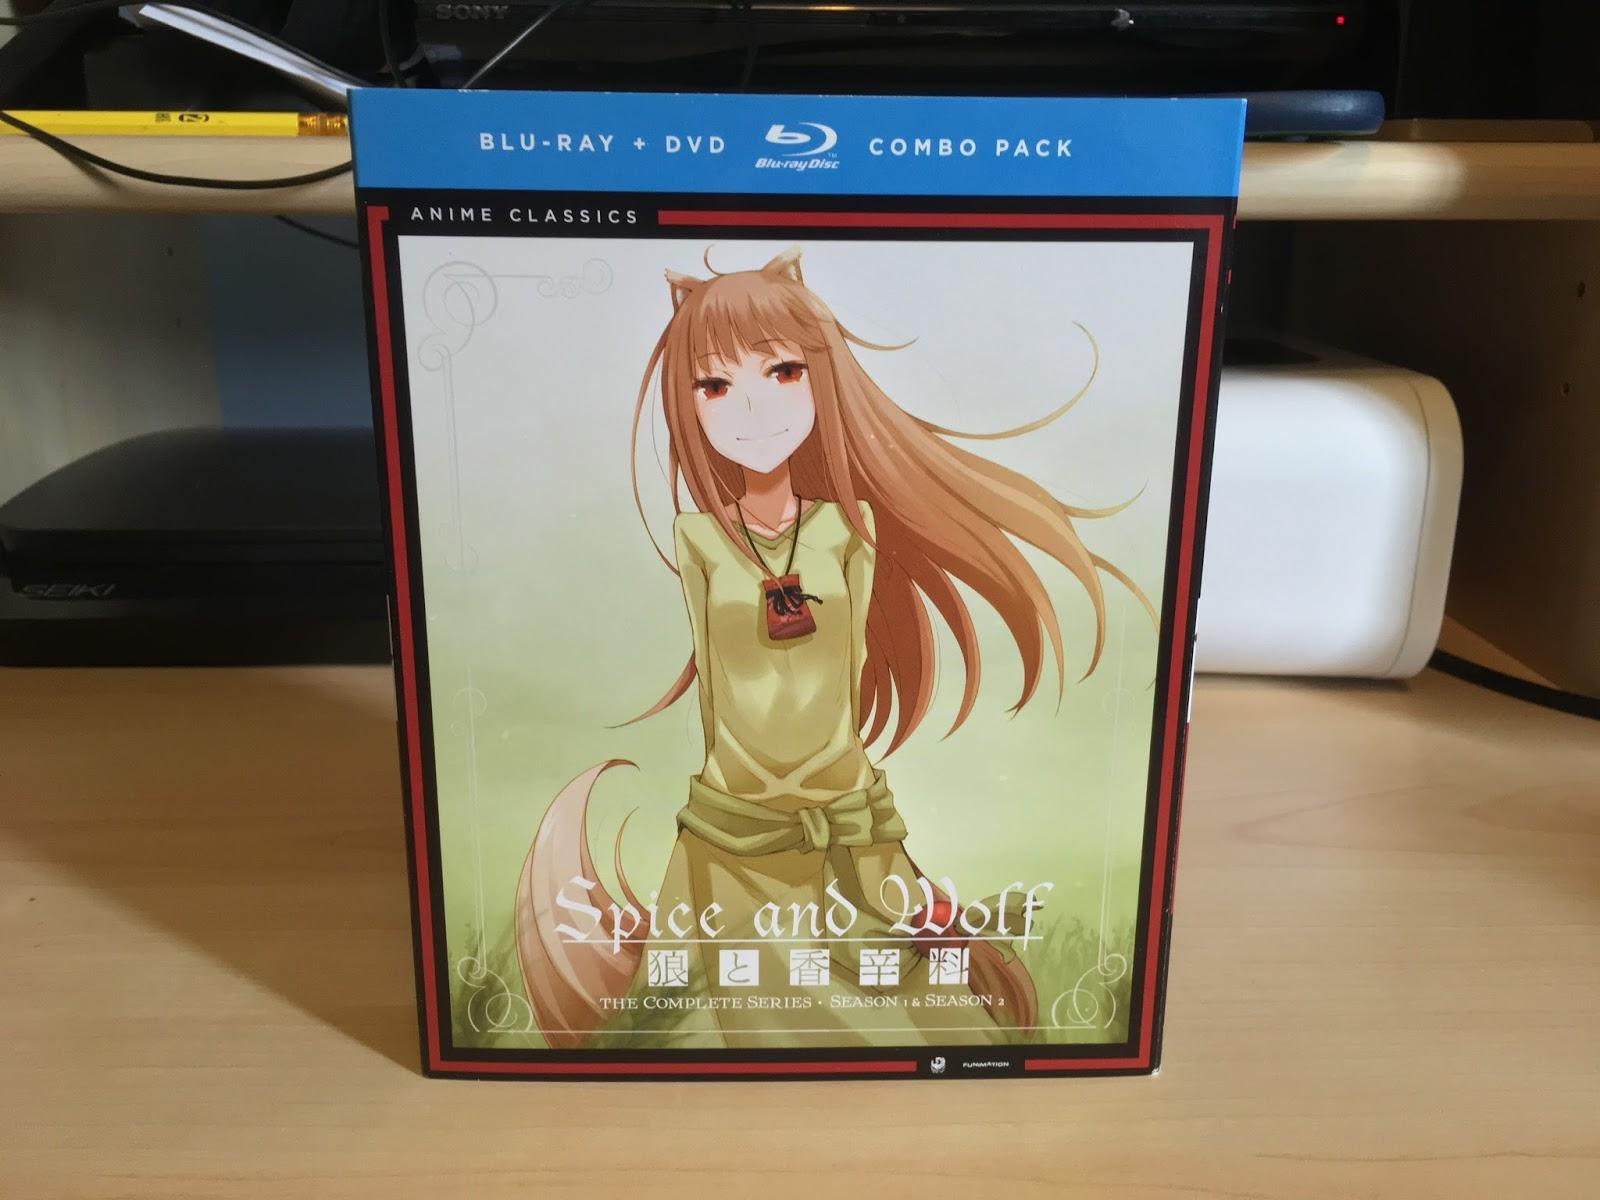 Animal instincts dvd zavvi com - Spice Wolf Ookami To Koushinryou Is A 2008 2009 Anime Adaptation Of The Novel Of The Same Name By Isuna Hasekura The Anime Adaptation Was Handled By